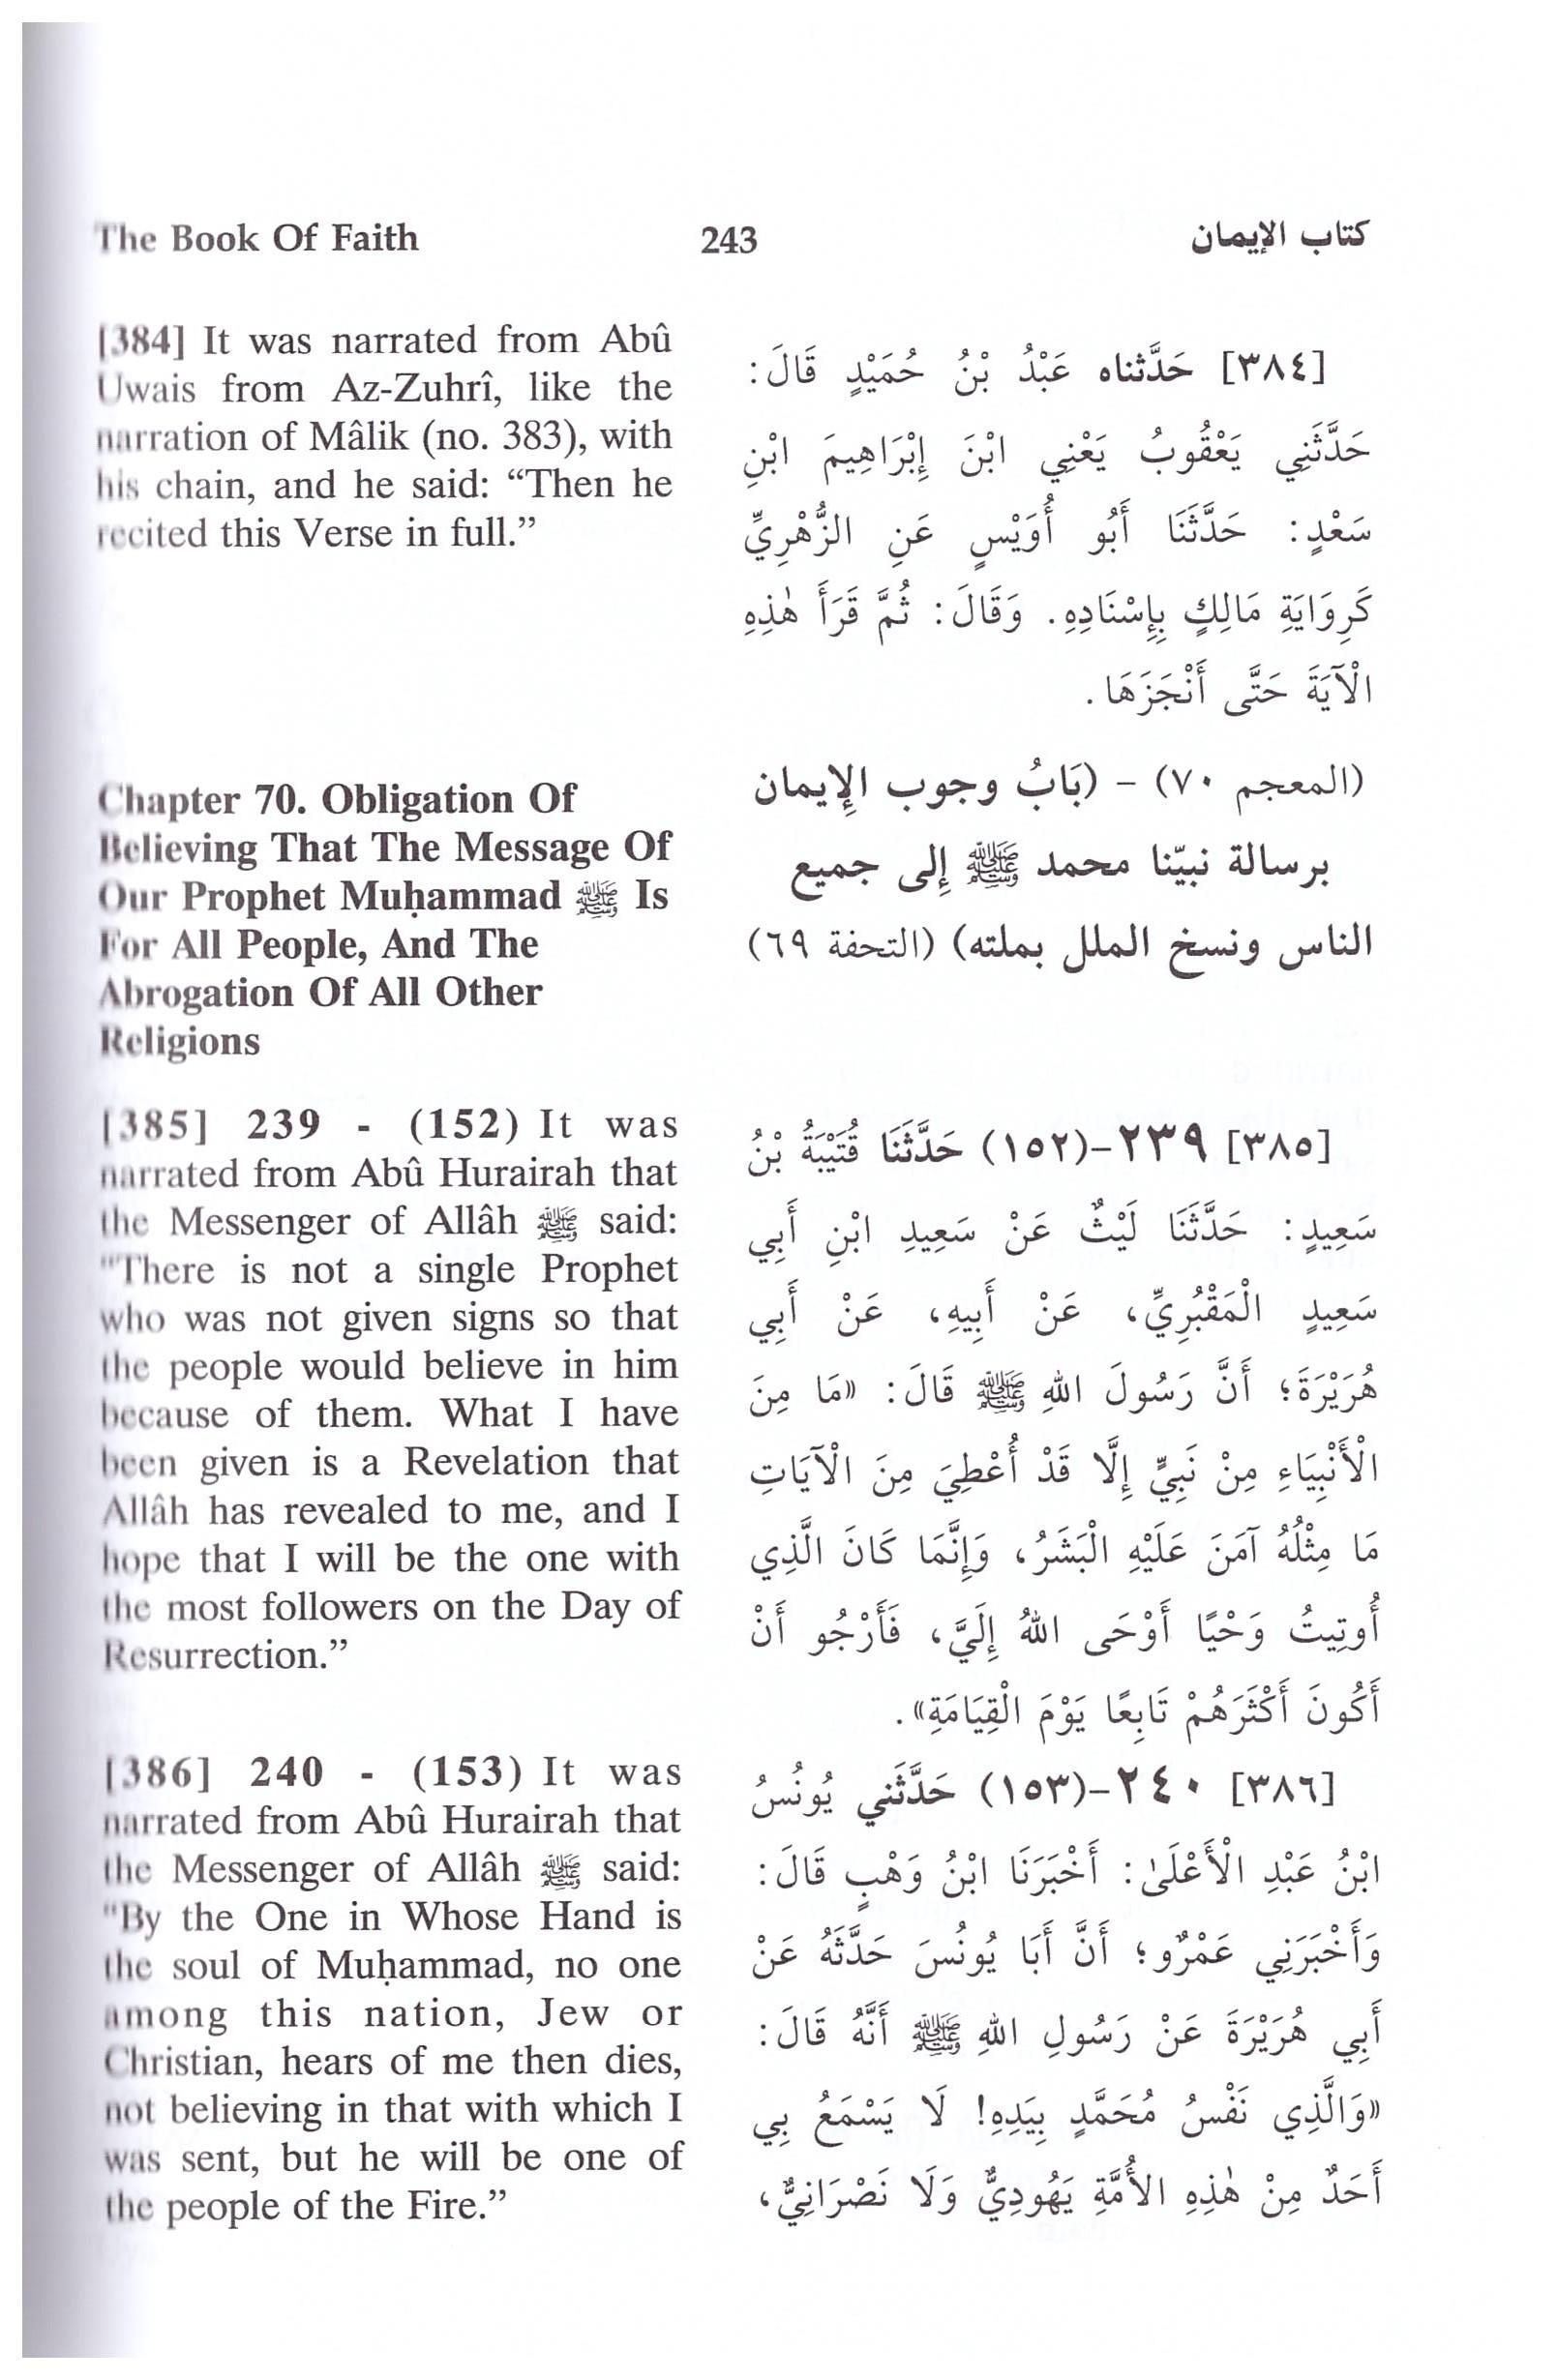 Sahih Muslim Arabic - English 7 Vols Darussalam, Nasiruddin